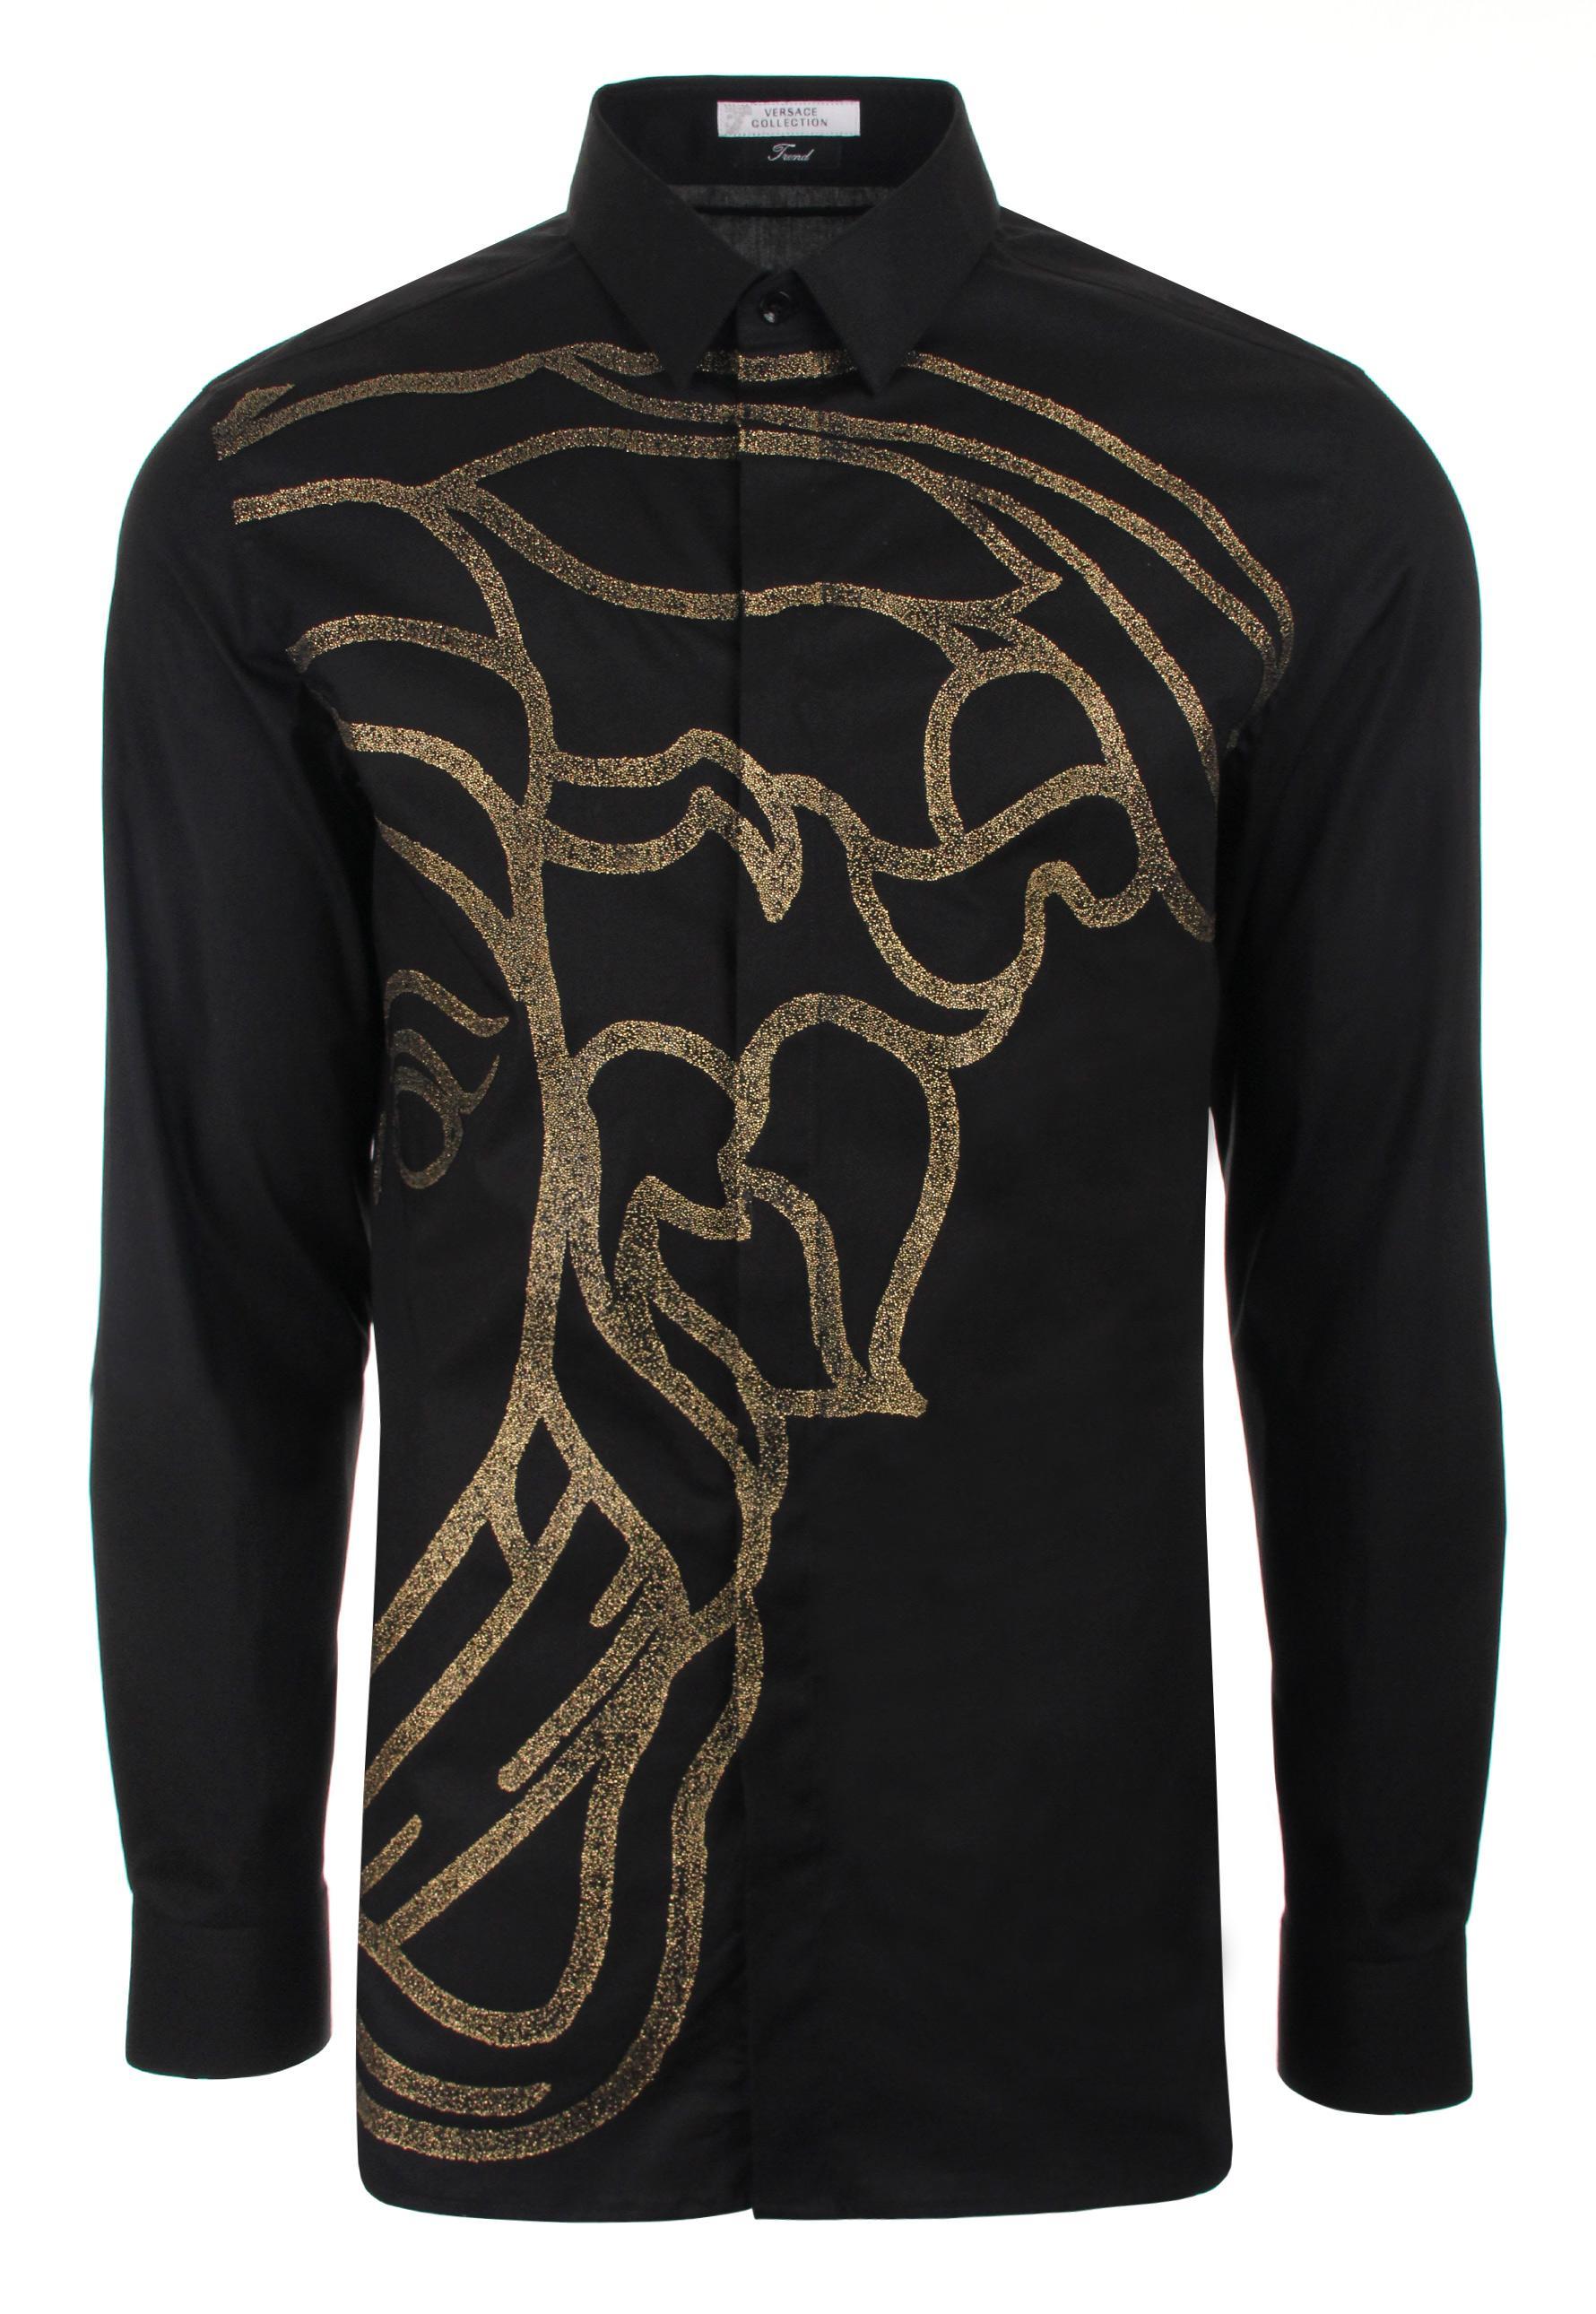 Lyst - Versace Caviar Print Medusa Head Shirt Black/gold ...